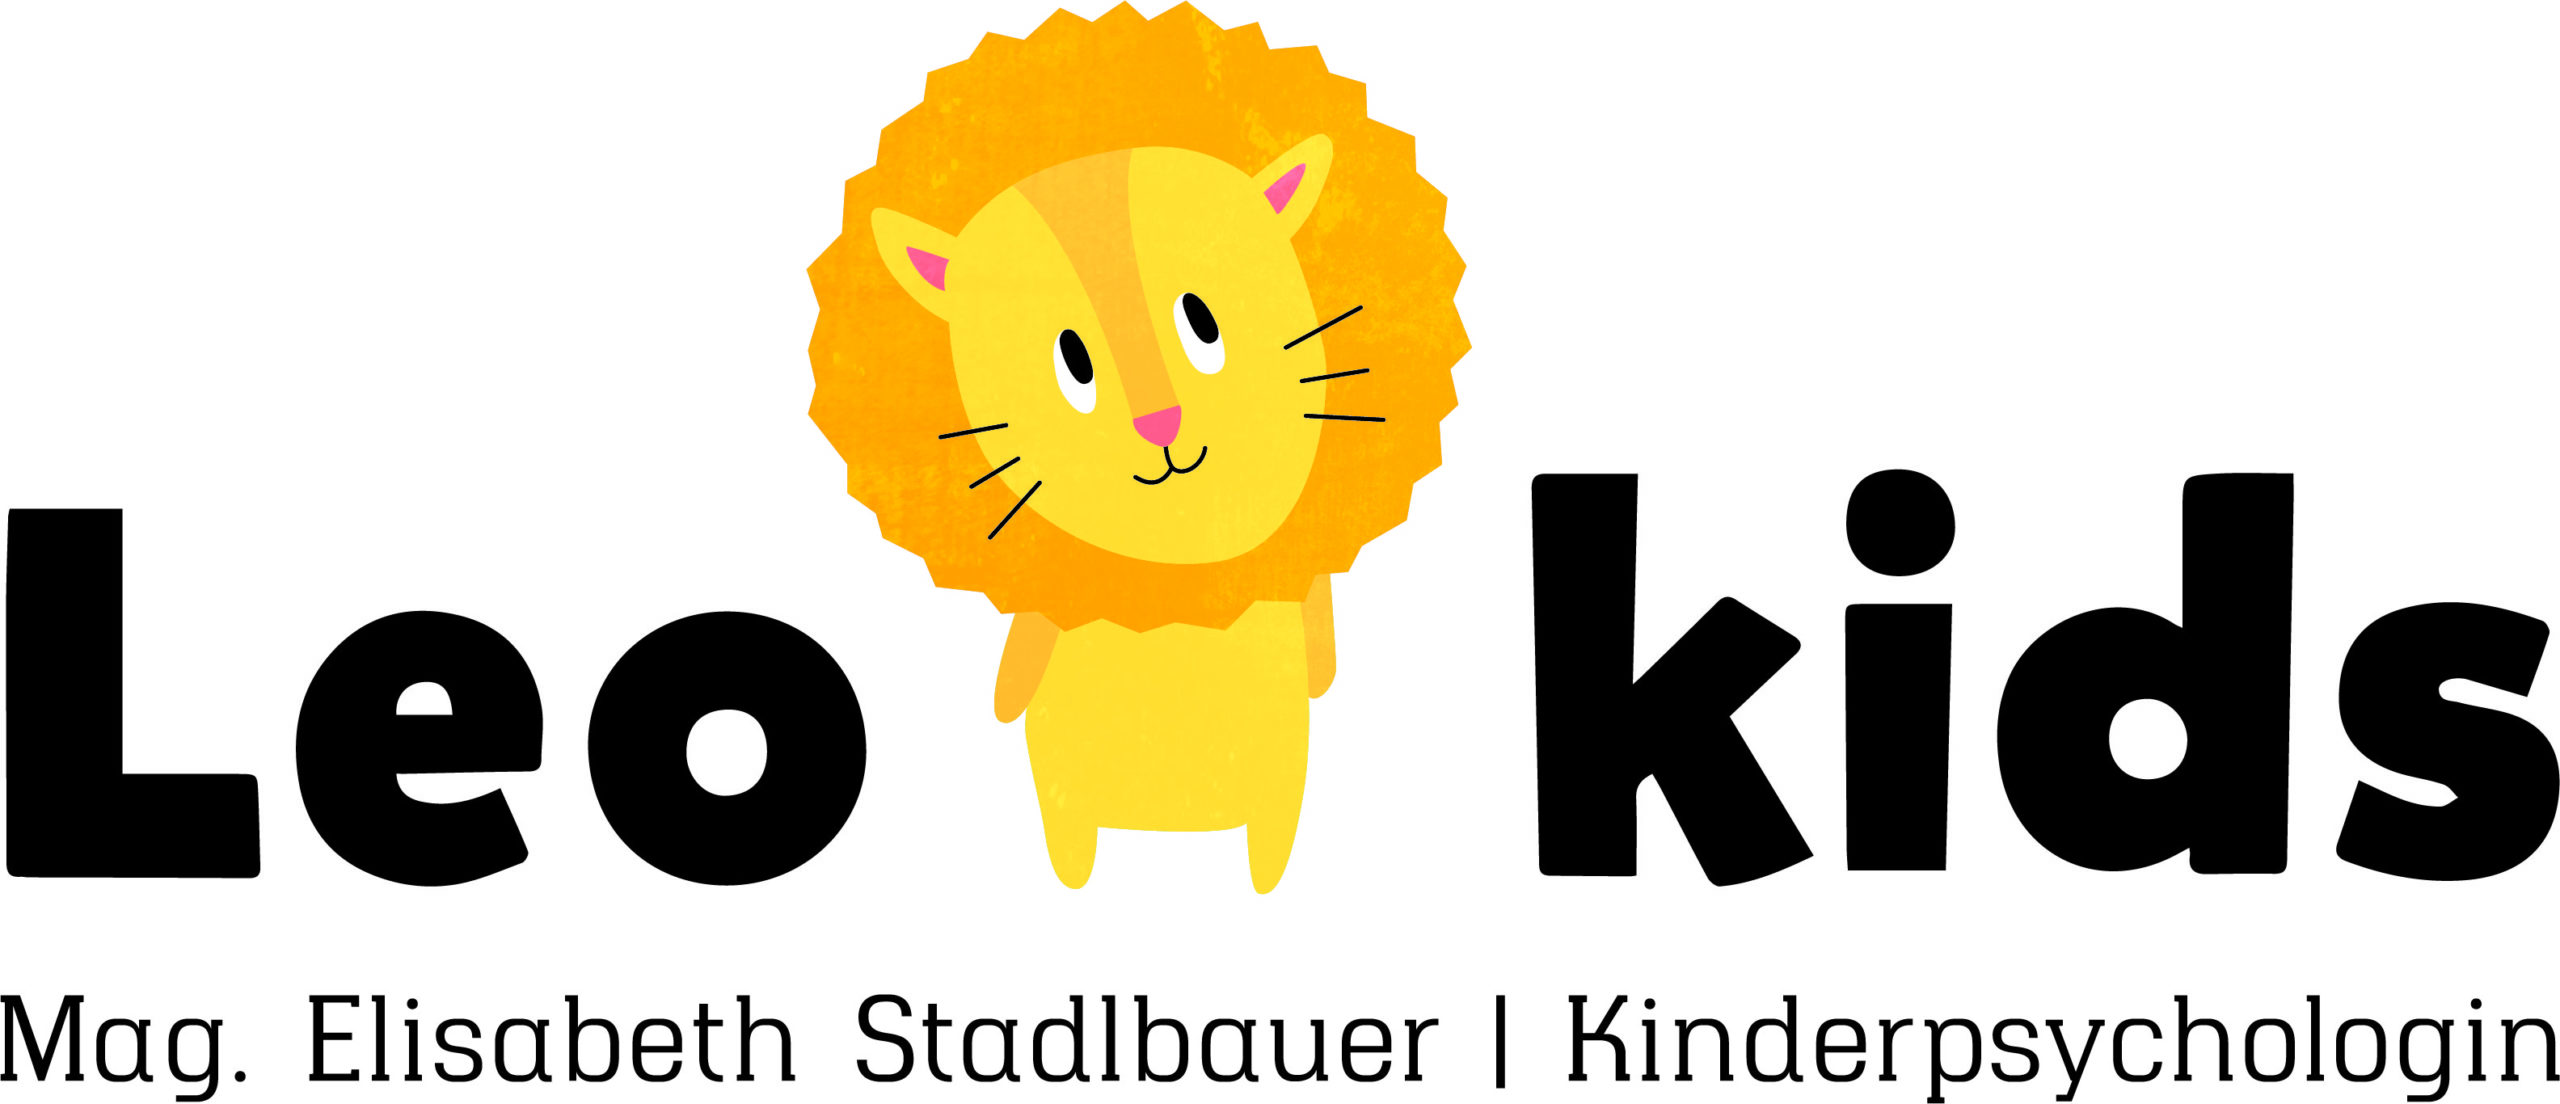 Mag. Elisabeth Stadlbauer, Kinderpsychologische Praxis Leokids